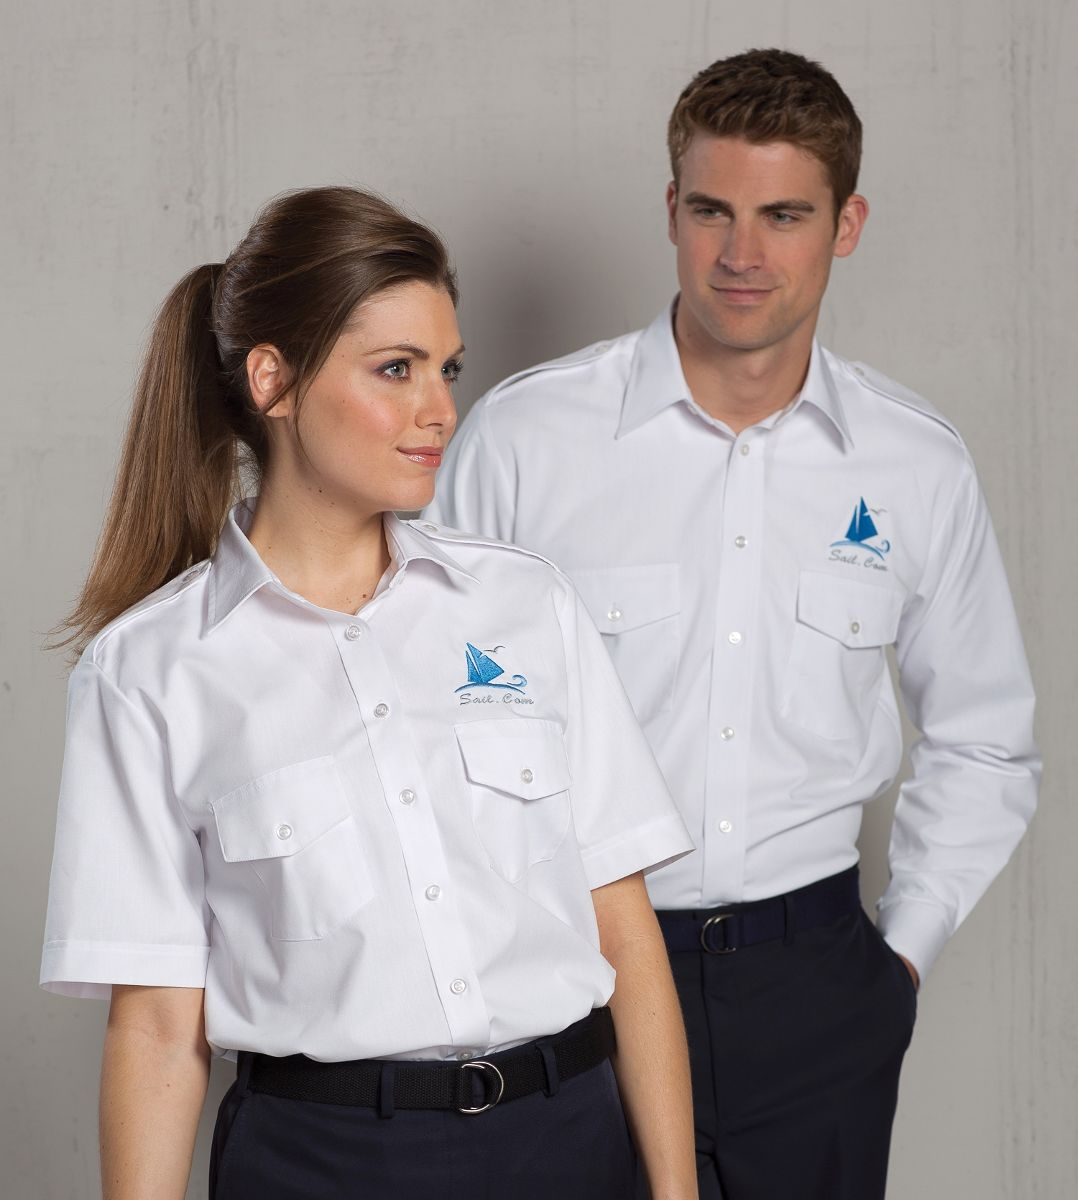 adc824a247e3 Custom Logo Shirts - DREAMWORKS